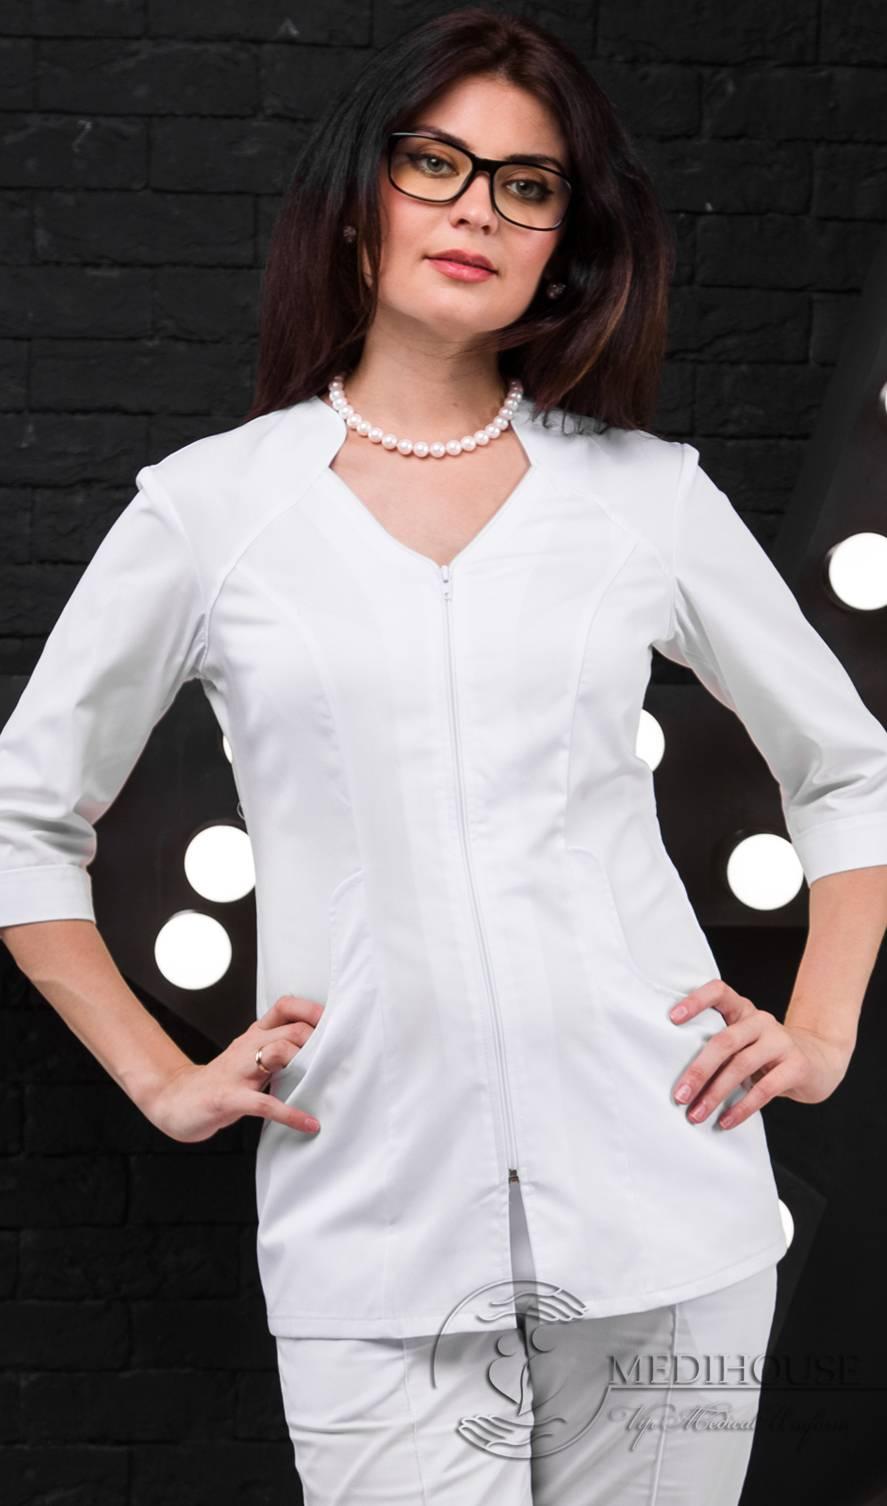 Женский медицинский блузон мод. 1.5 White